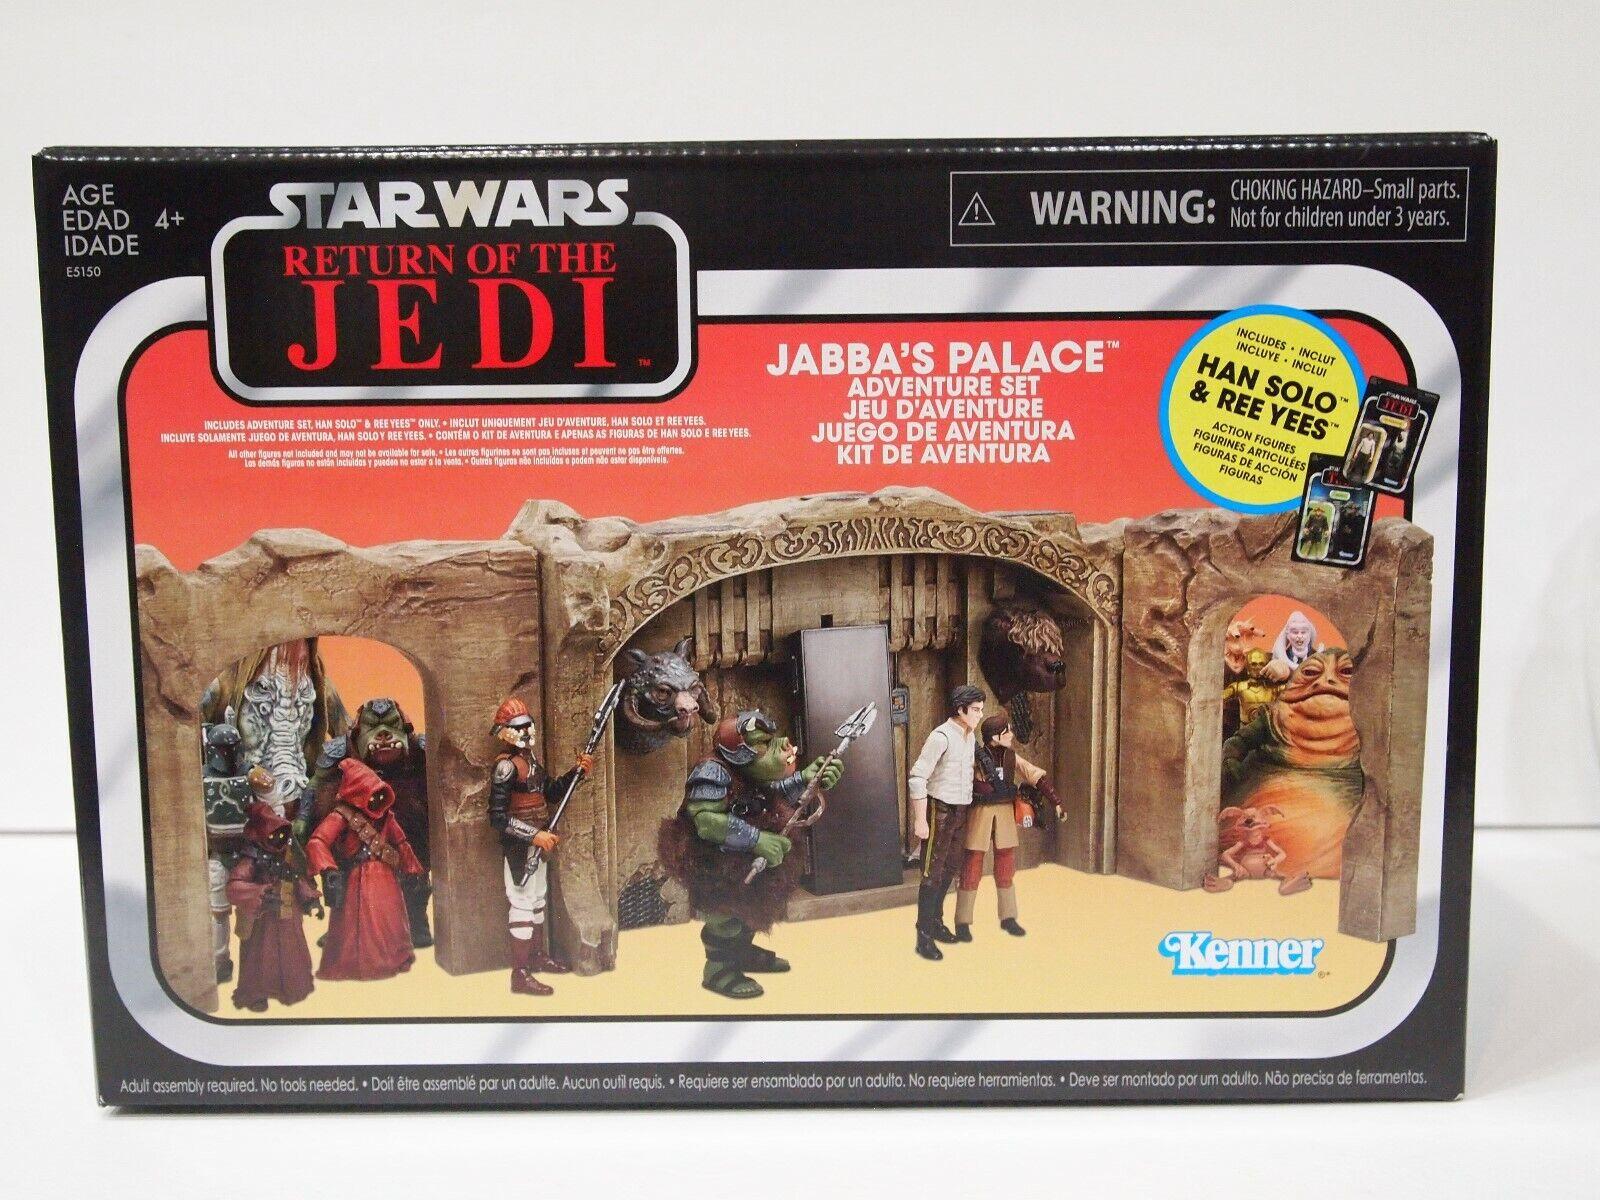 Star Wars Vintage Collection - Jabba's Palace - Hasbro 2019 Walmart Exclusive